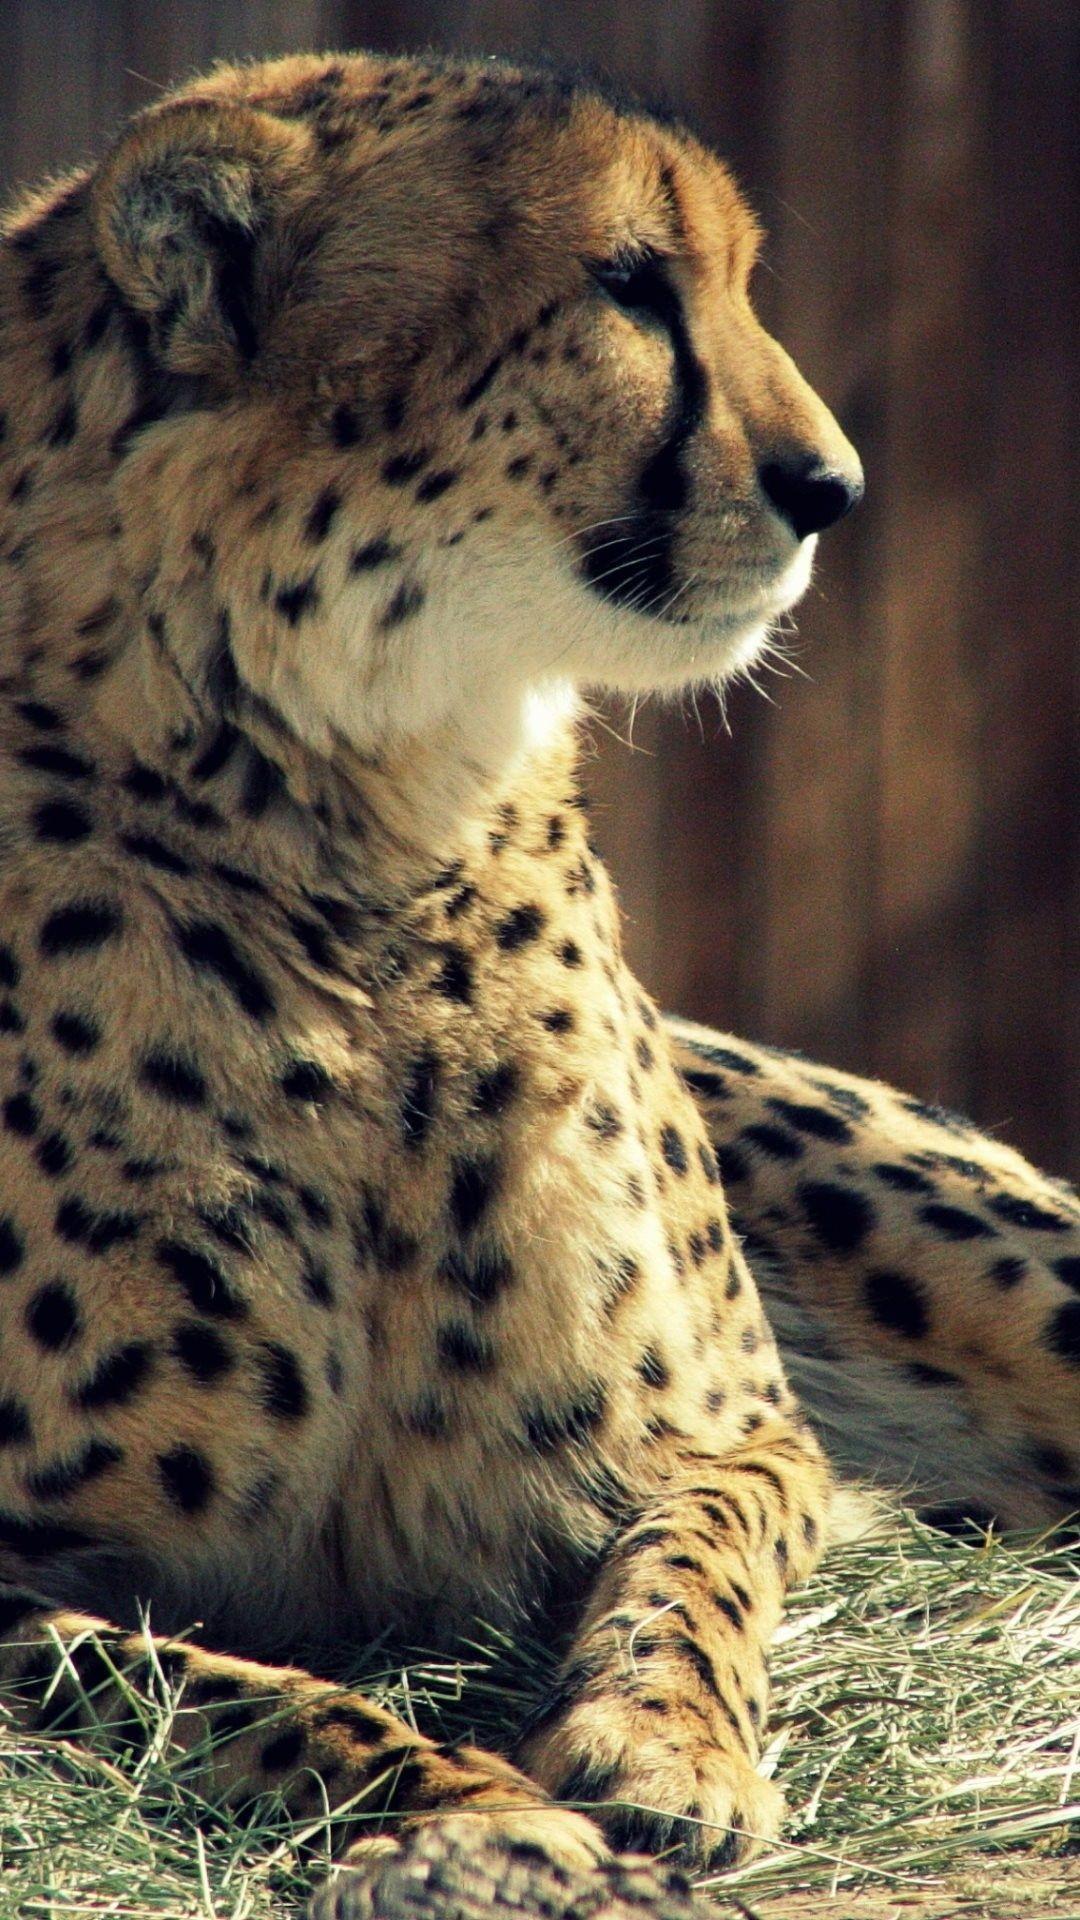 Res: 1080x1920, iPhone 6s Cheetah Wallpaper HD • iPhones Wallpapers